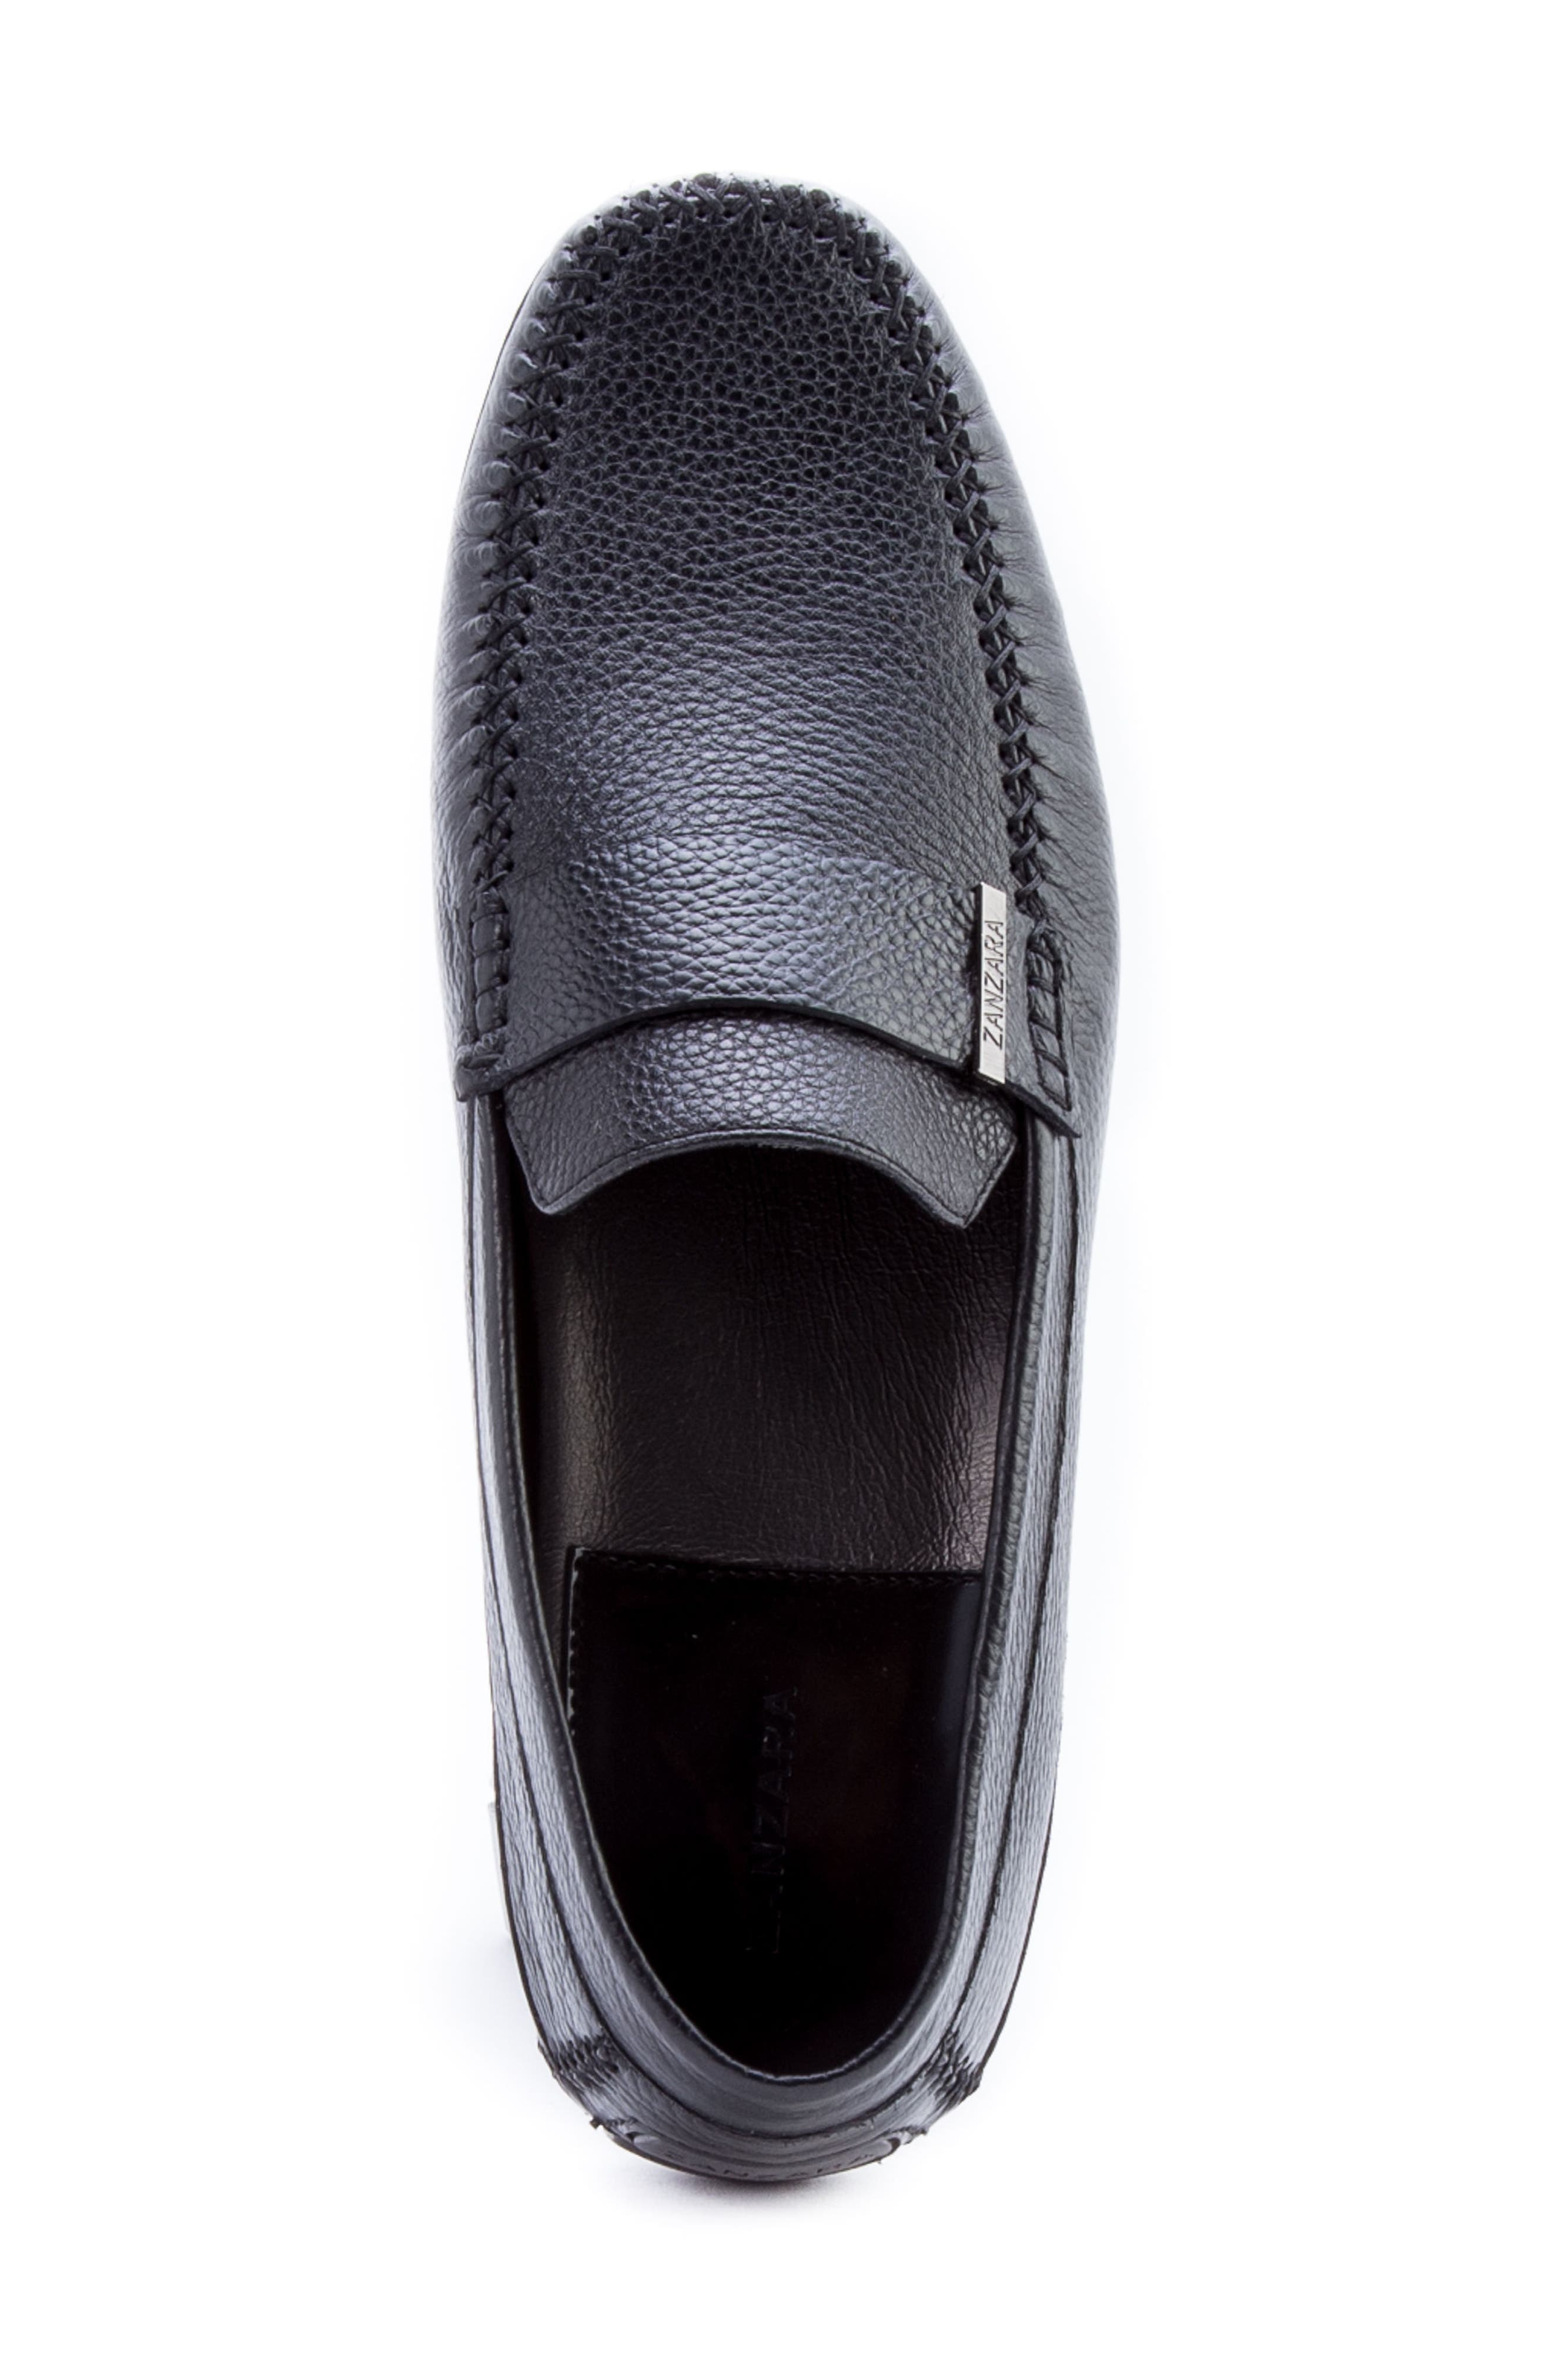 Kandinsky Moc Toe Driving Loafer,                             Alternate thumbnail 5, color,                             Black Leather